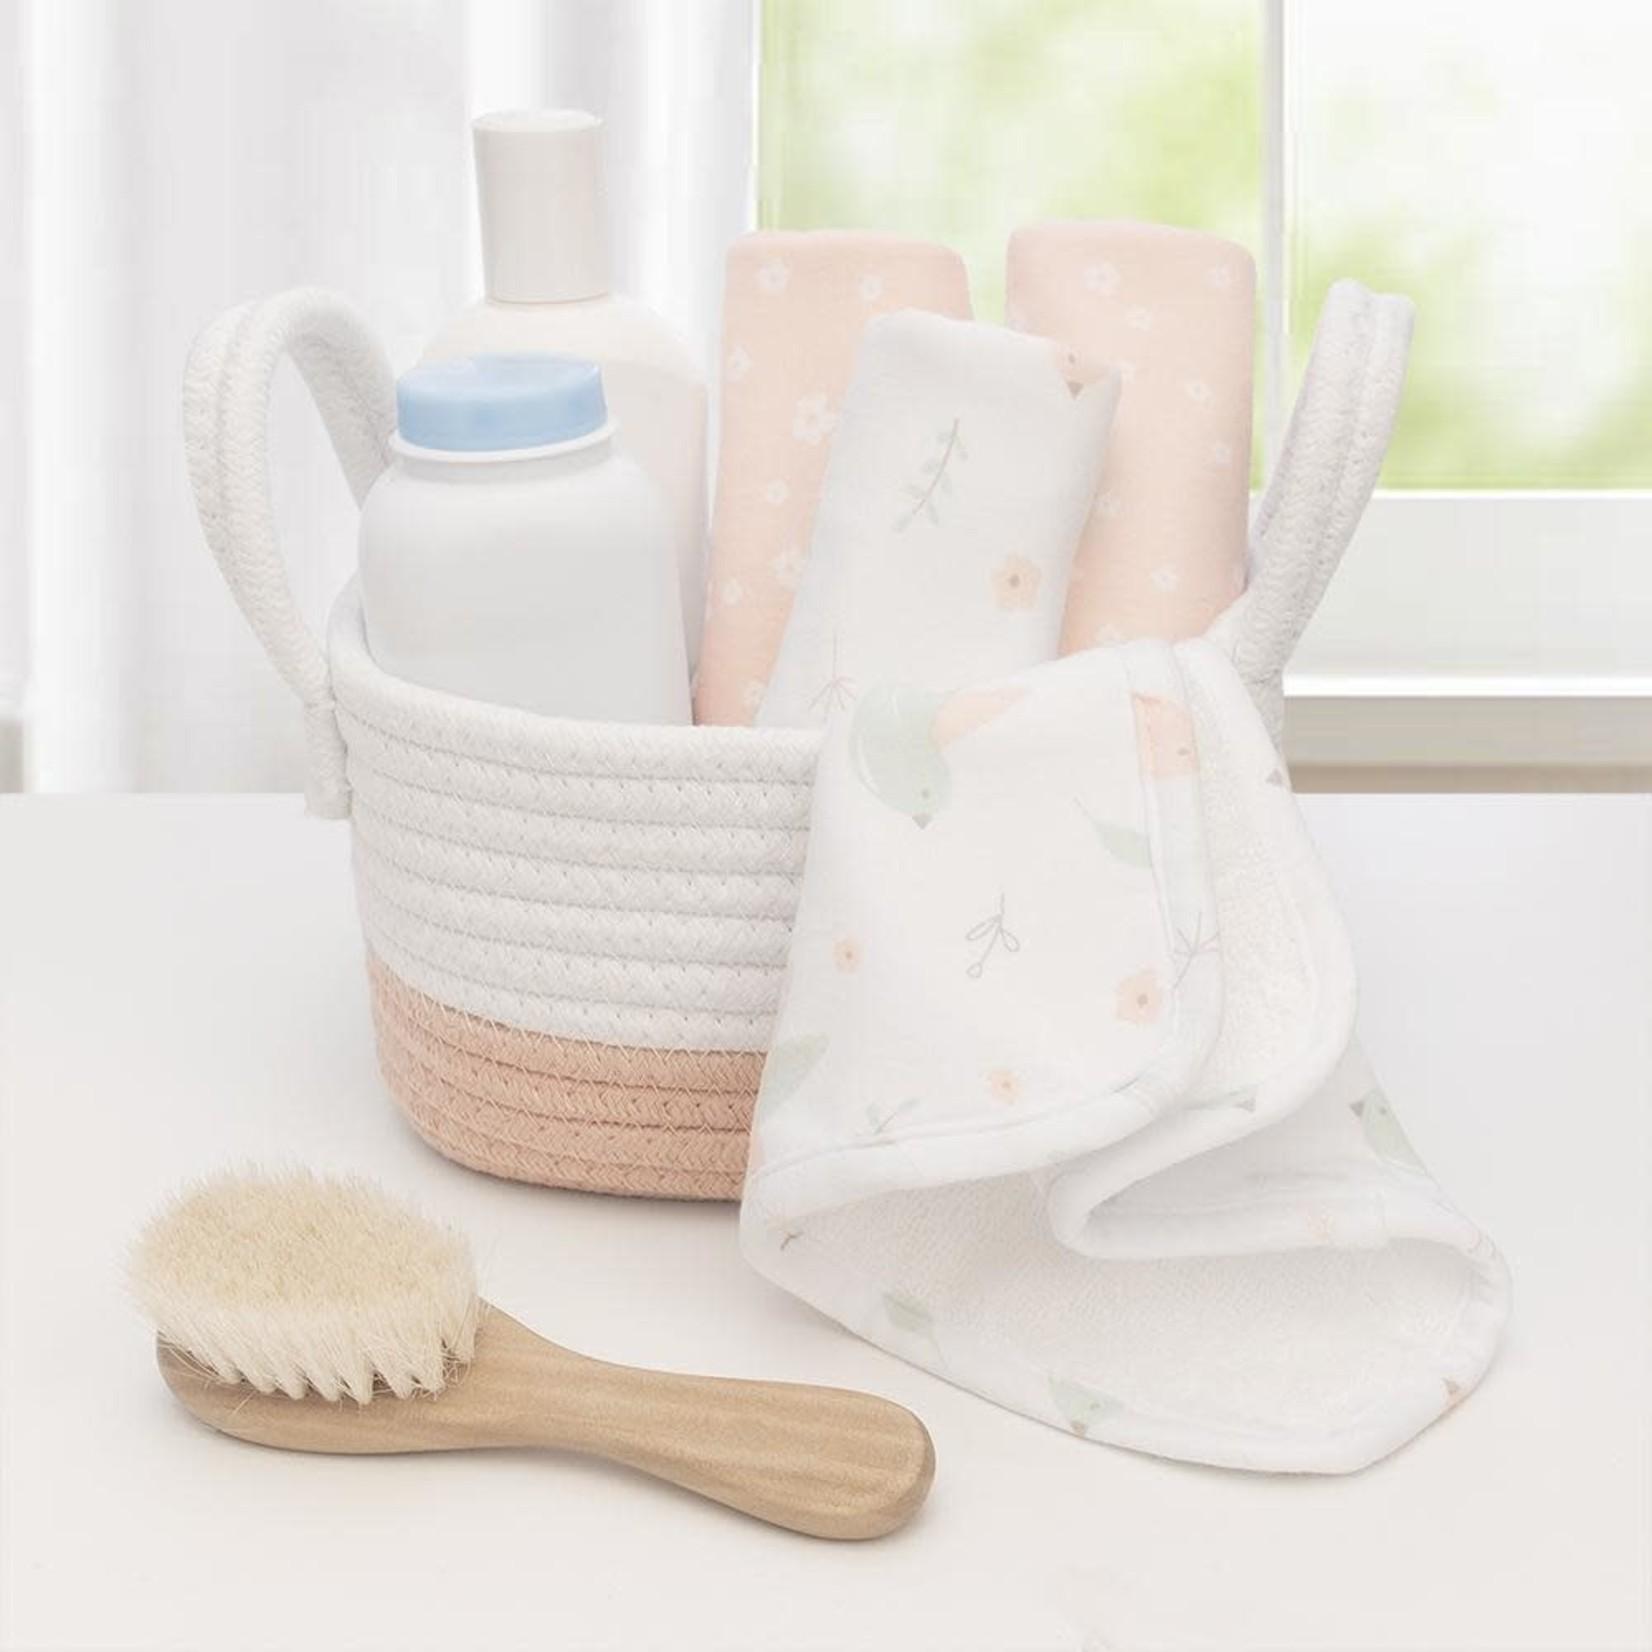 Living Textiles Living  Textiles Wash Cloths 4pk - Ava/Blush Floral